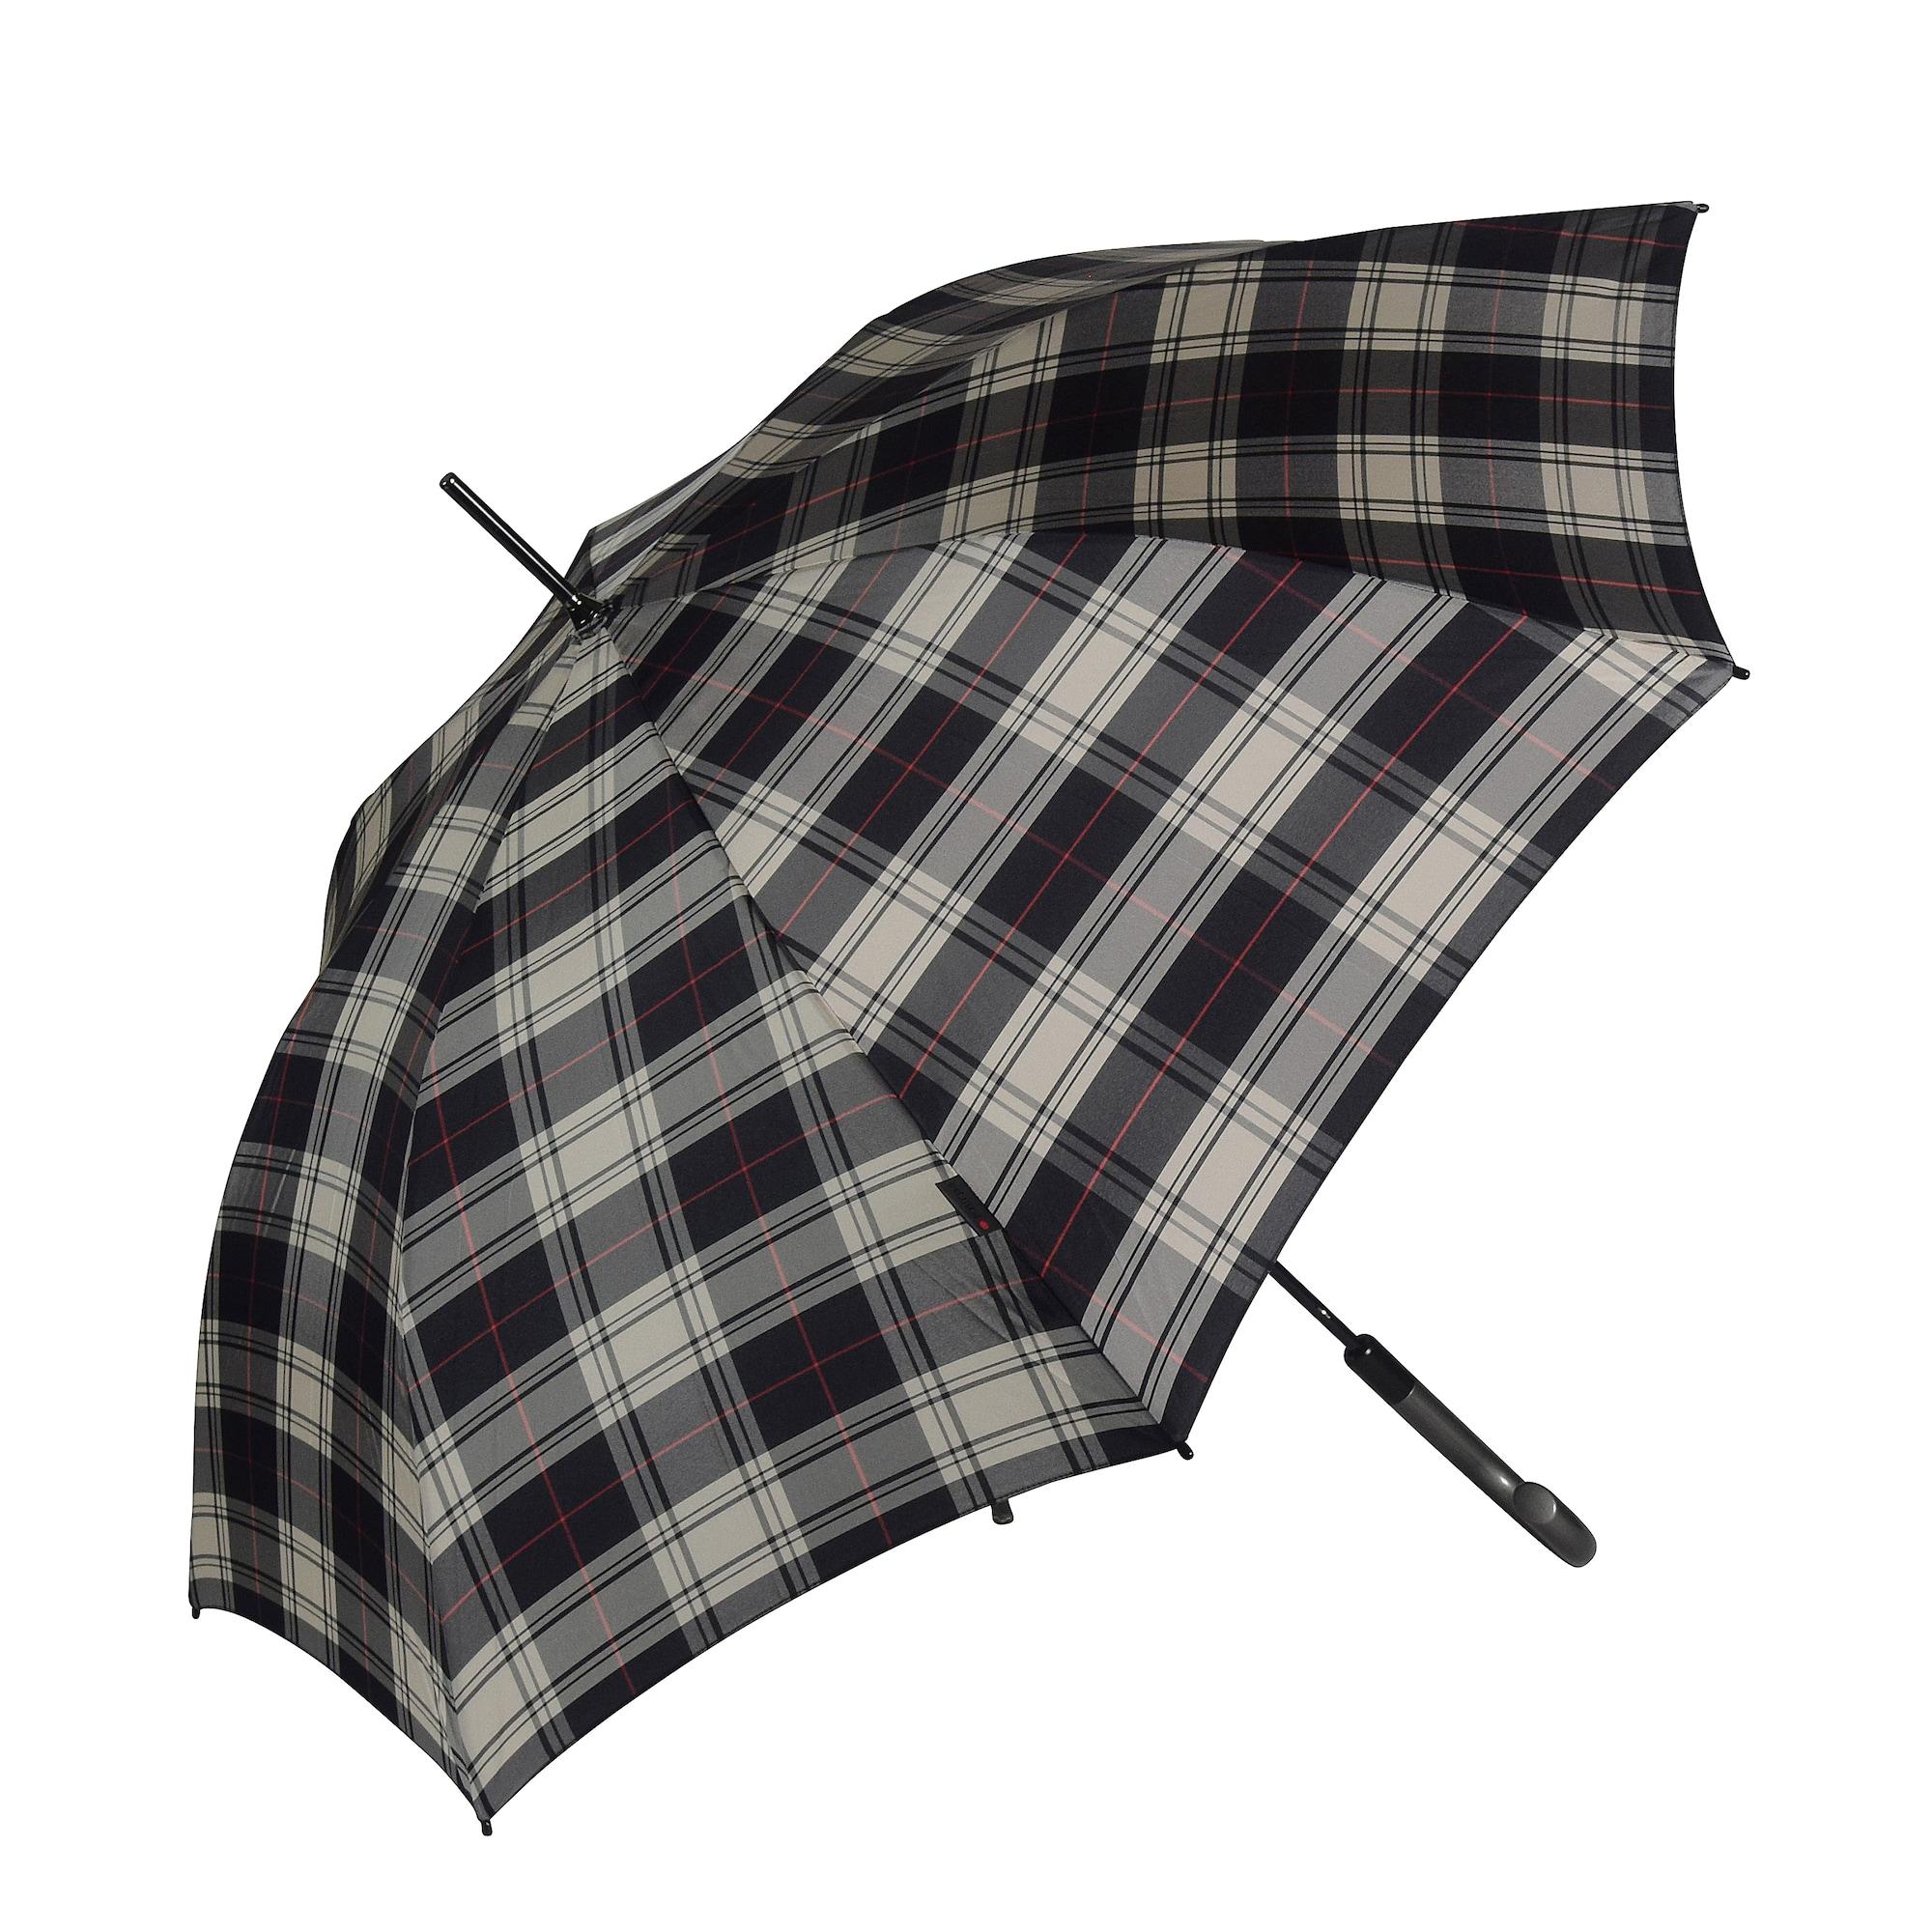 Stockschirm 'T.703' 88 cm | Accessoires > Regenschirme > Stockschirme | Beige - Grau - Rot - Schwarz | knirps